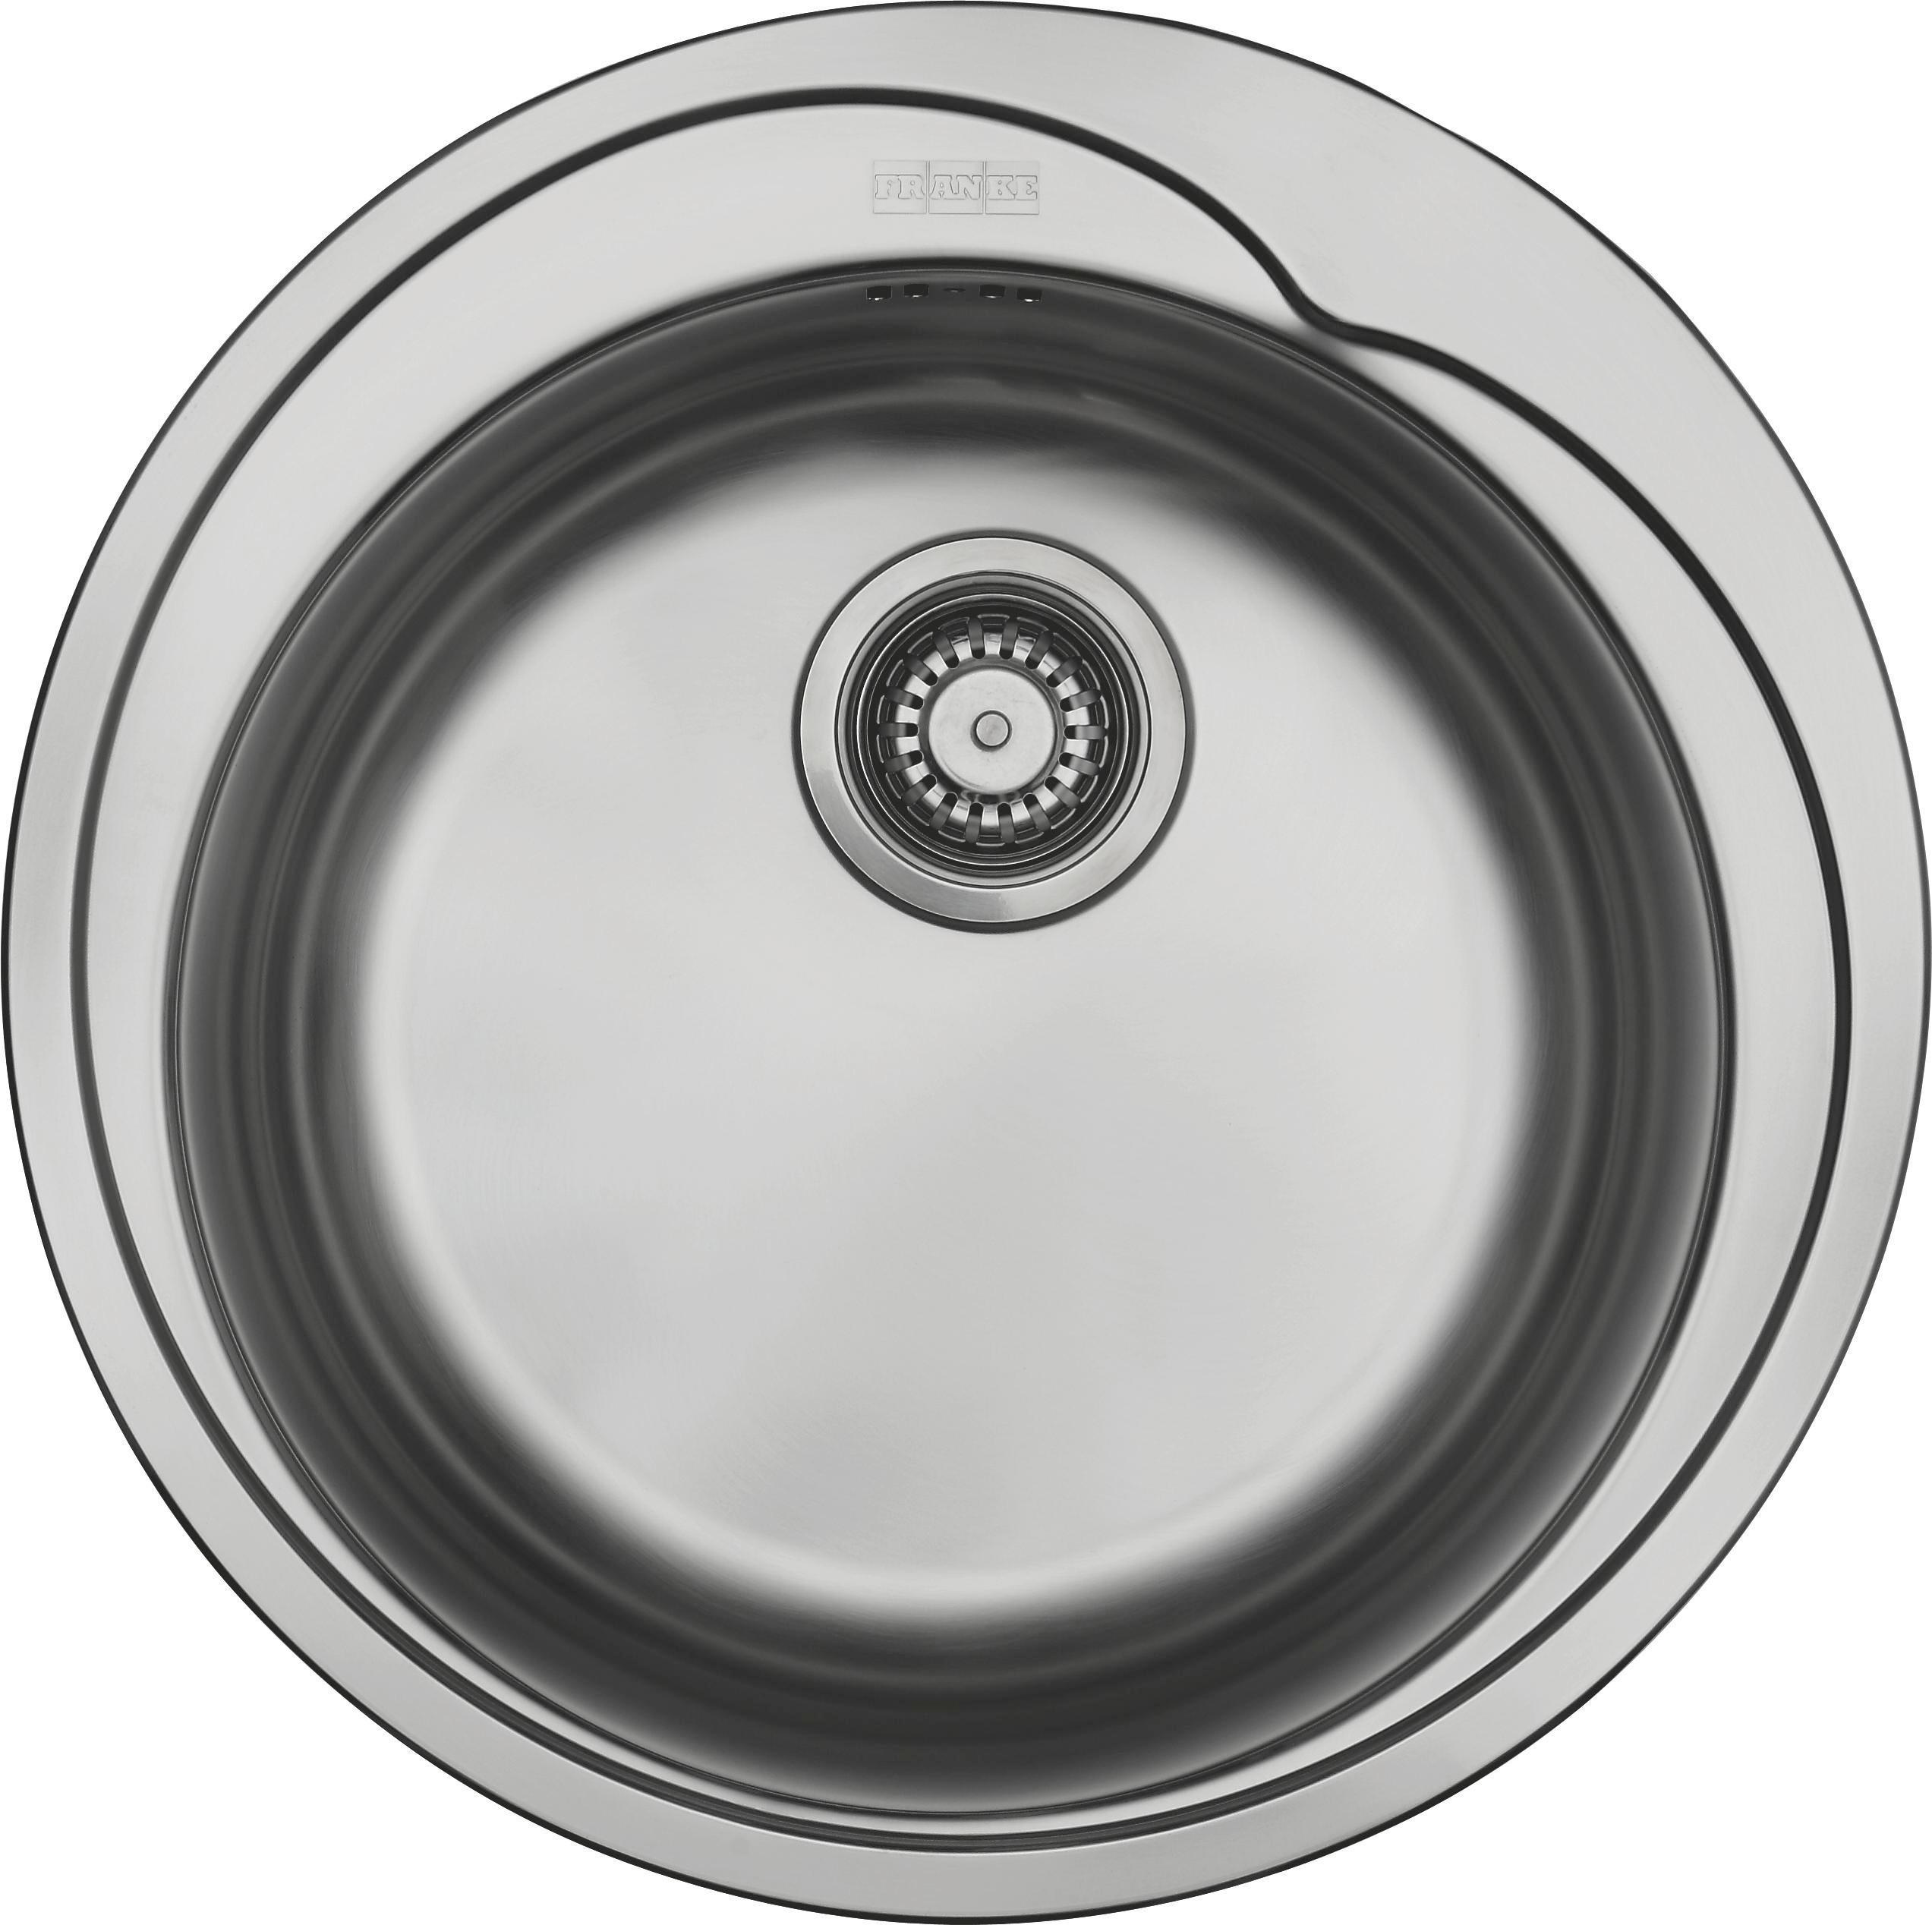 Spüle Rox610-41 - MODERN (51cm) - FRANKE